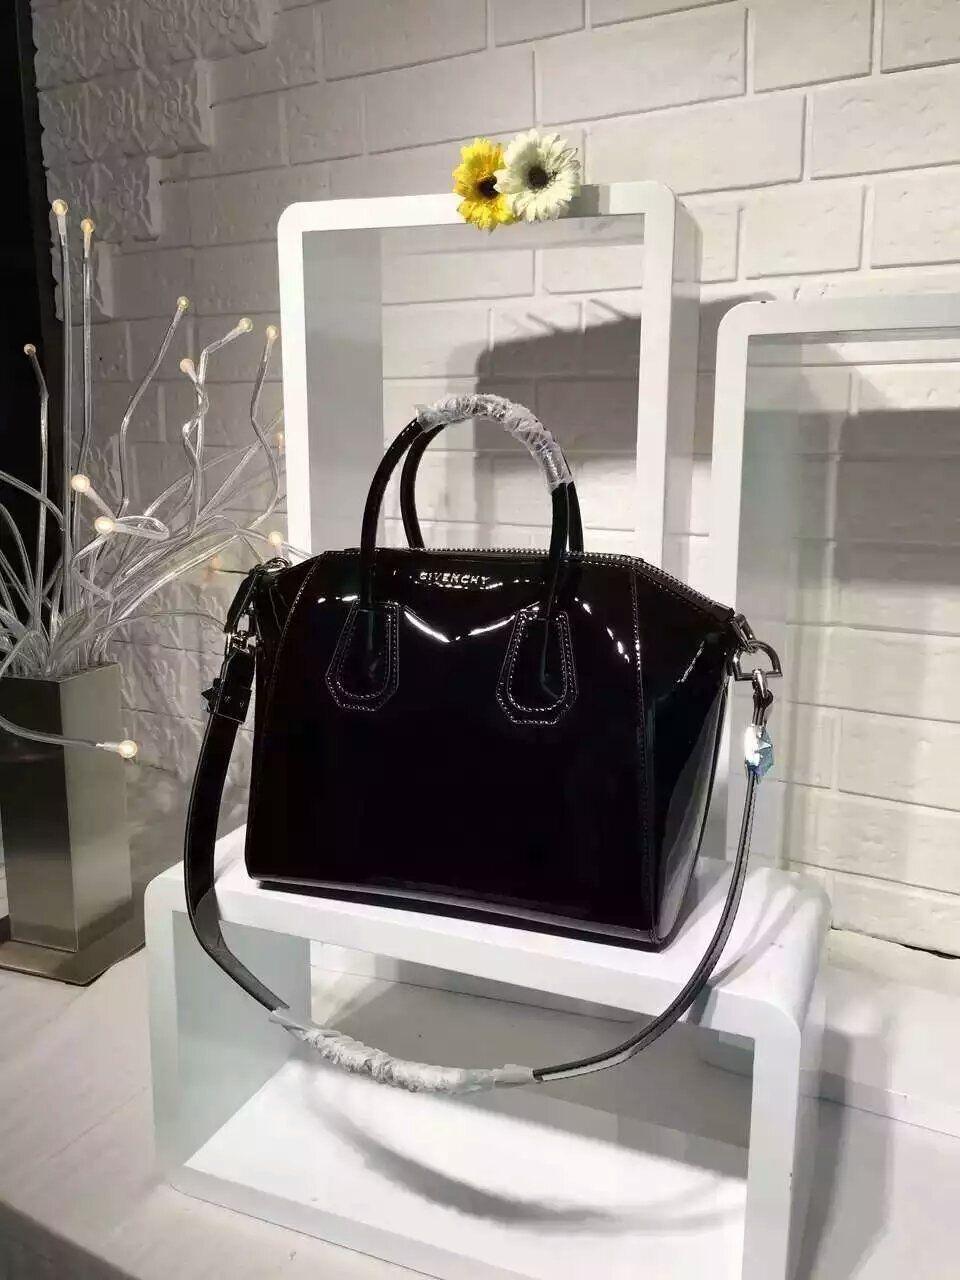 b7b4d5792bf 2016 New Givenchy Antigona Tote Bags Black Original Patent Leather Givenchy  Antigona Tote Bags mini size:23cm,small size:28cm. Whatsapp:+8615817091613